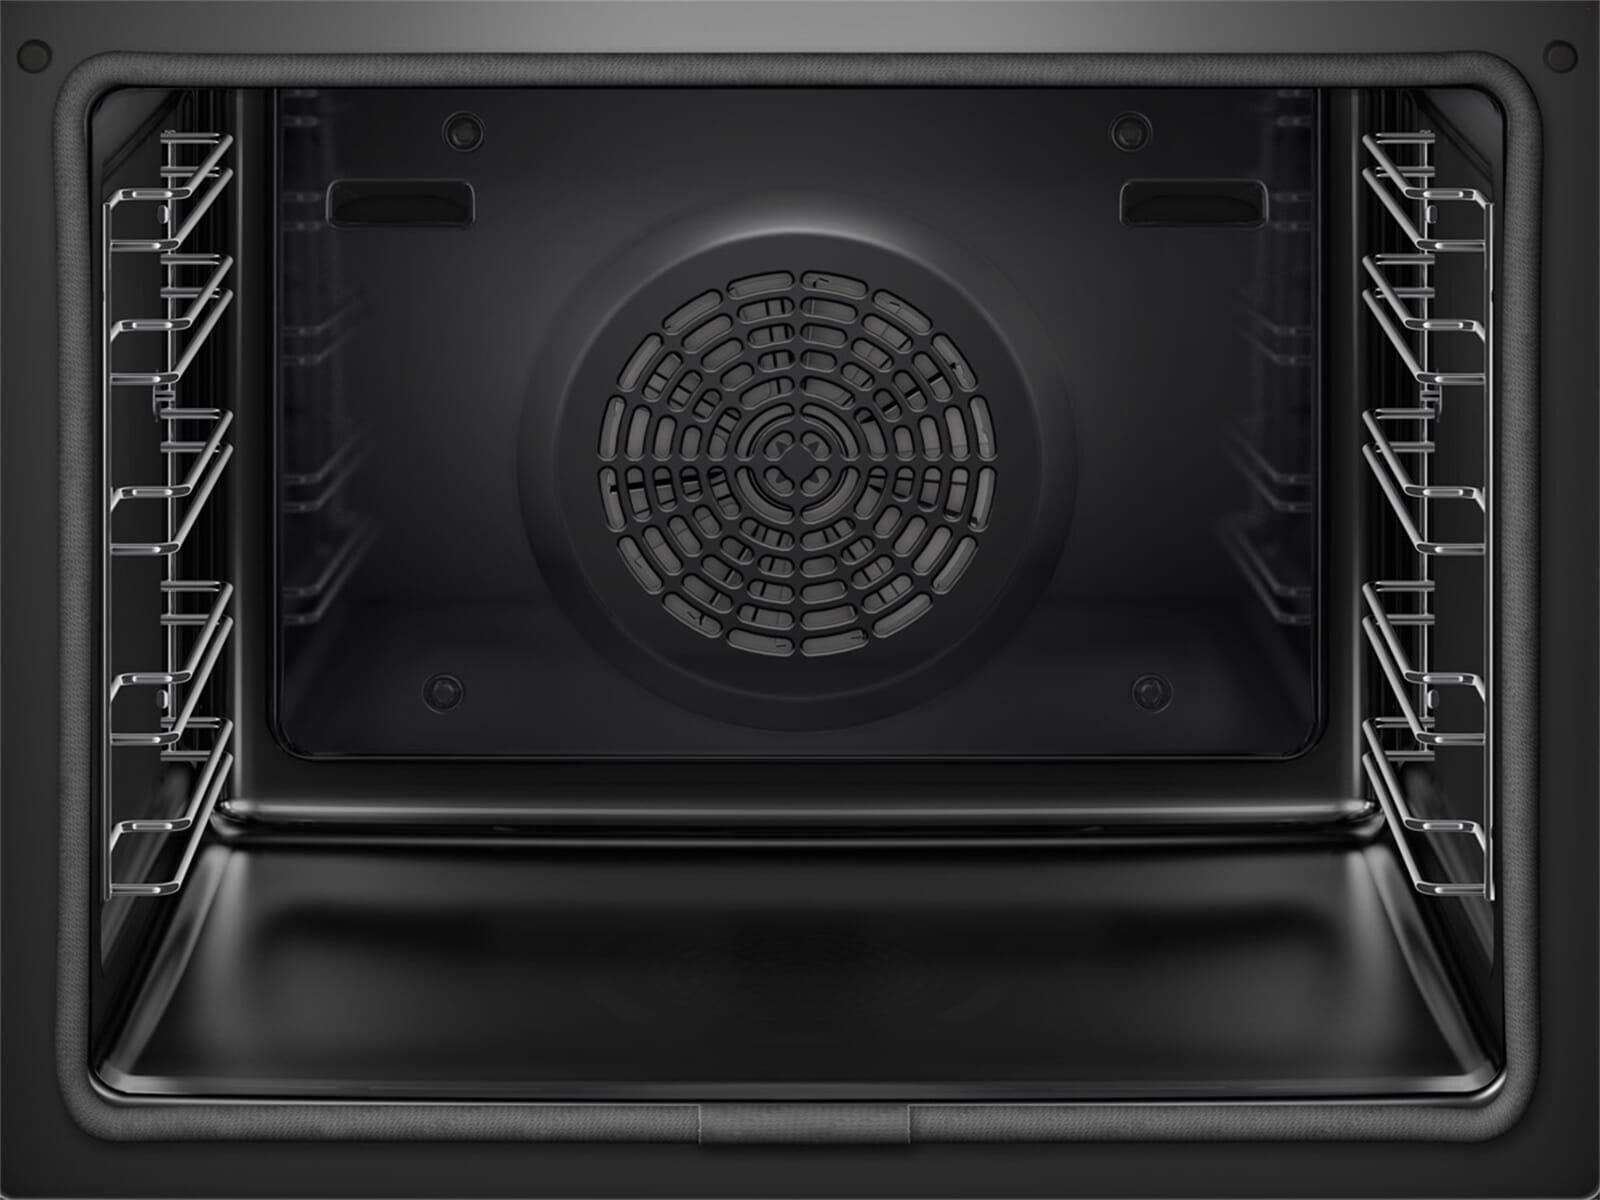 bosch hbg675bs1 pyrolyse backofen edelstahl einbaubackofen backherd einbauofen ebay. Black Bedroom Furniture Sets. Home Design Ideas